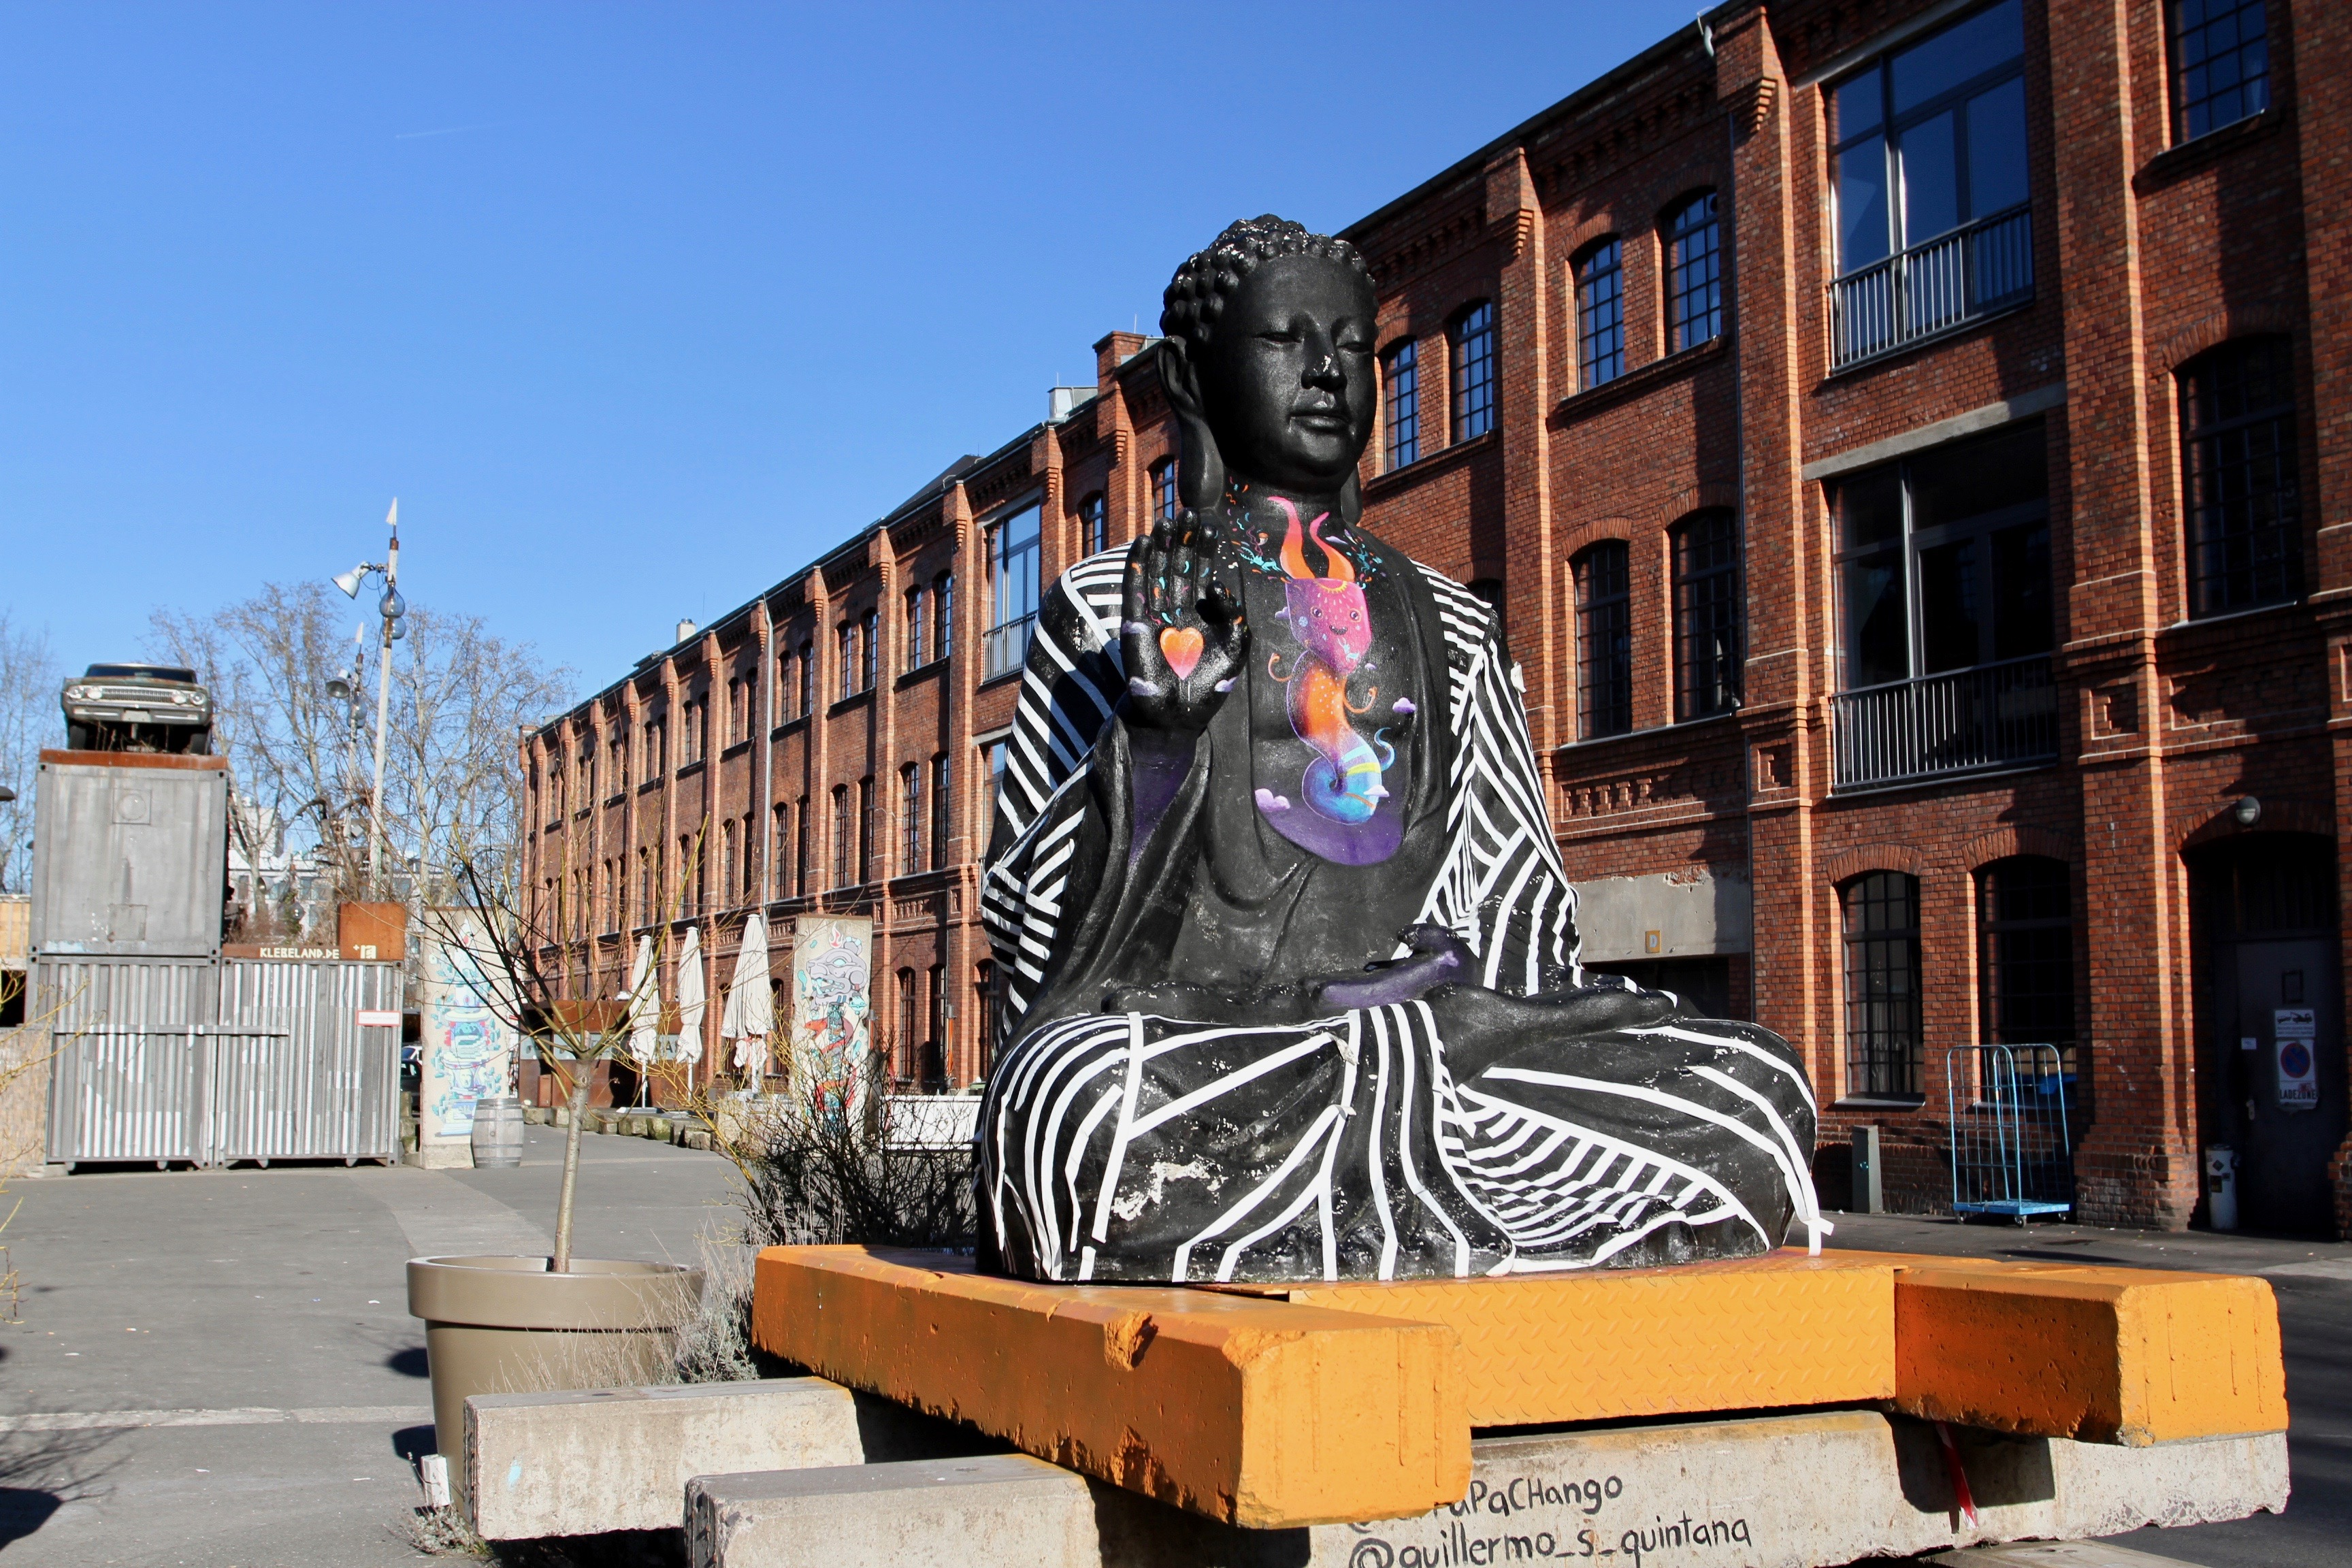 Buddha statue, Berlin, Germany